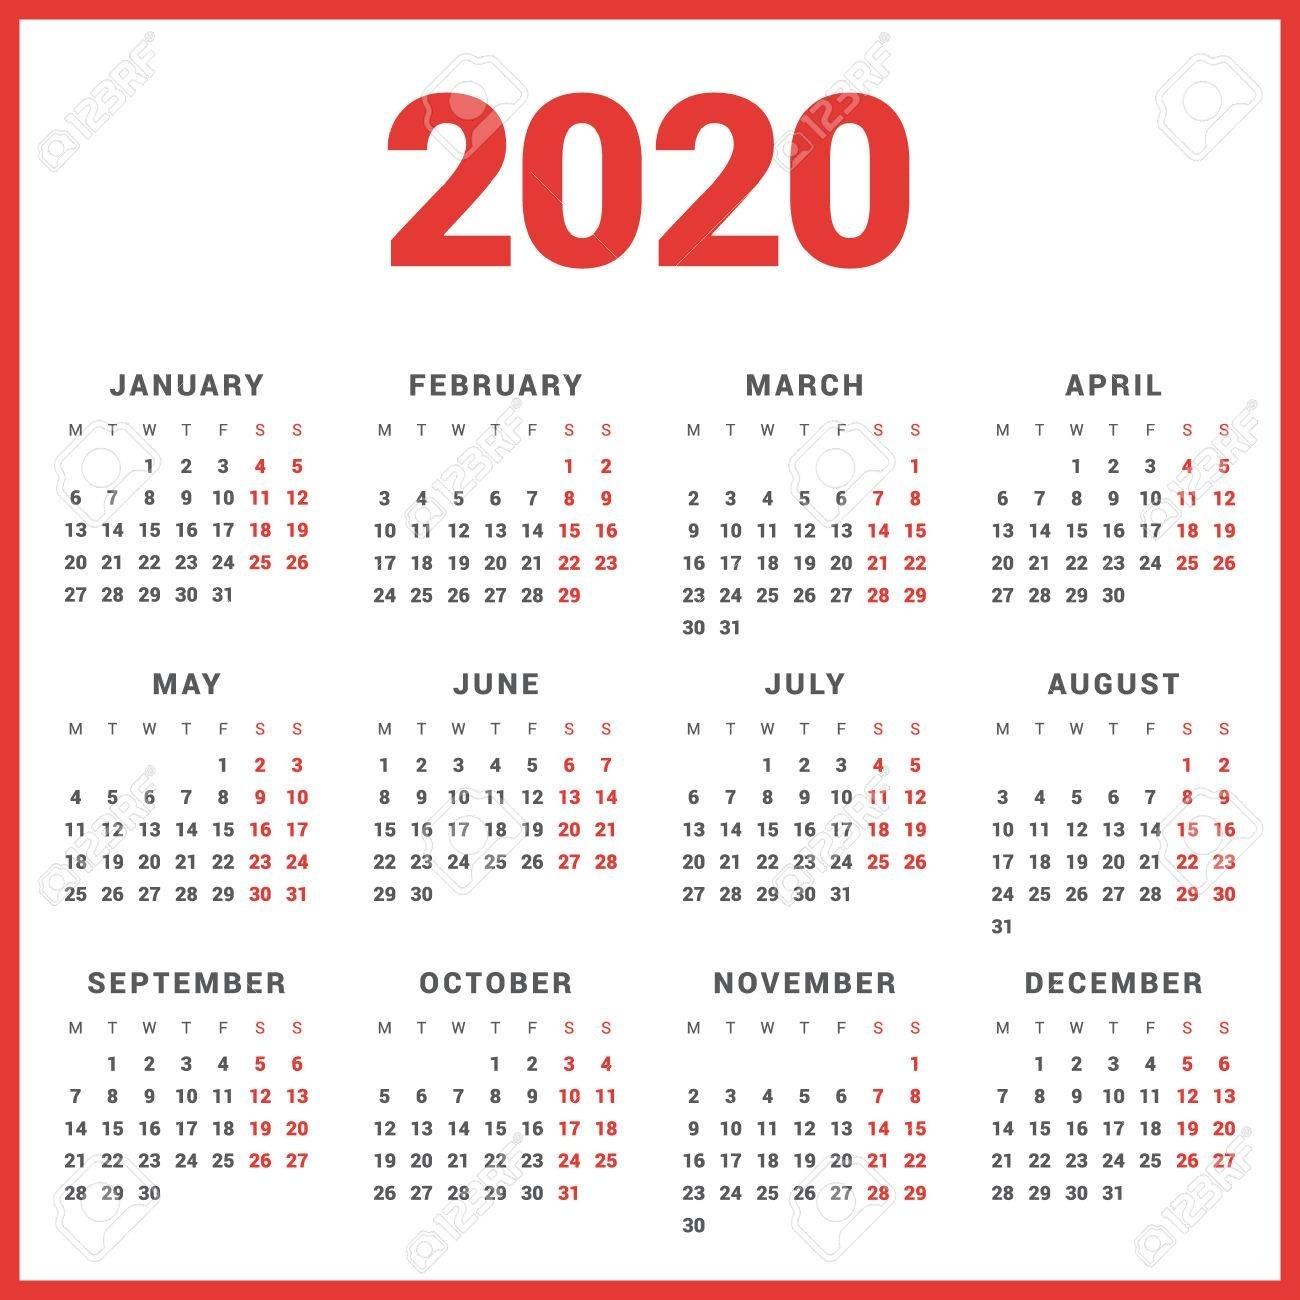 Monday Start Calendar 2020 - Colona.rsd7 for 2020 Calendar Template Monday Sunday